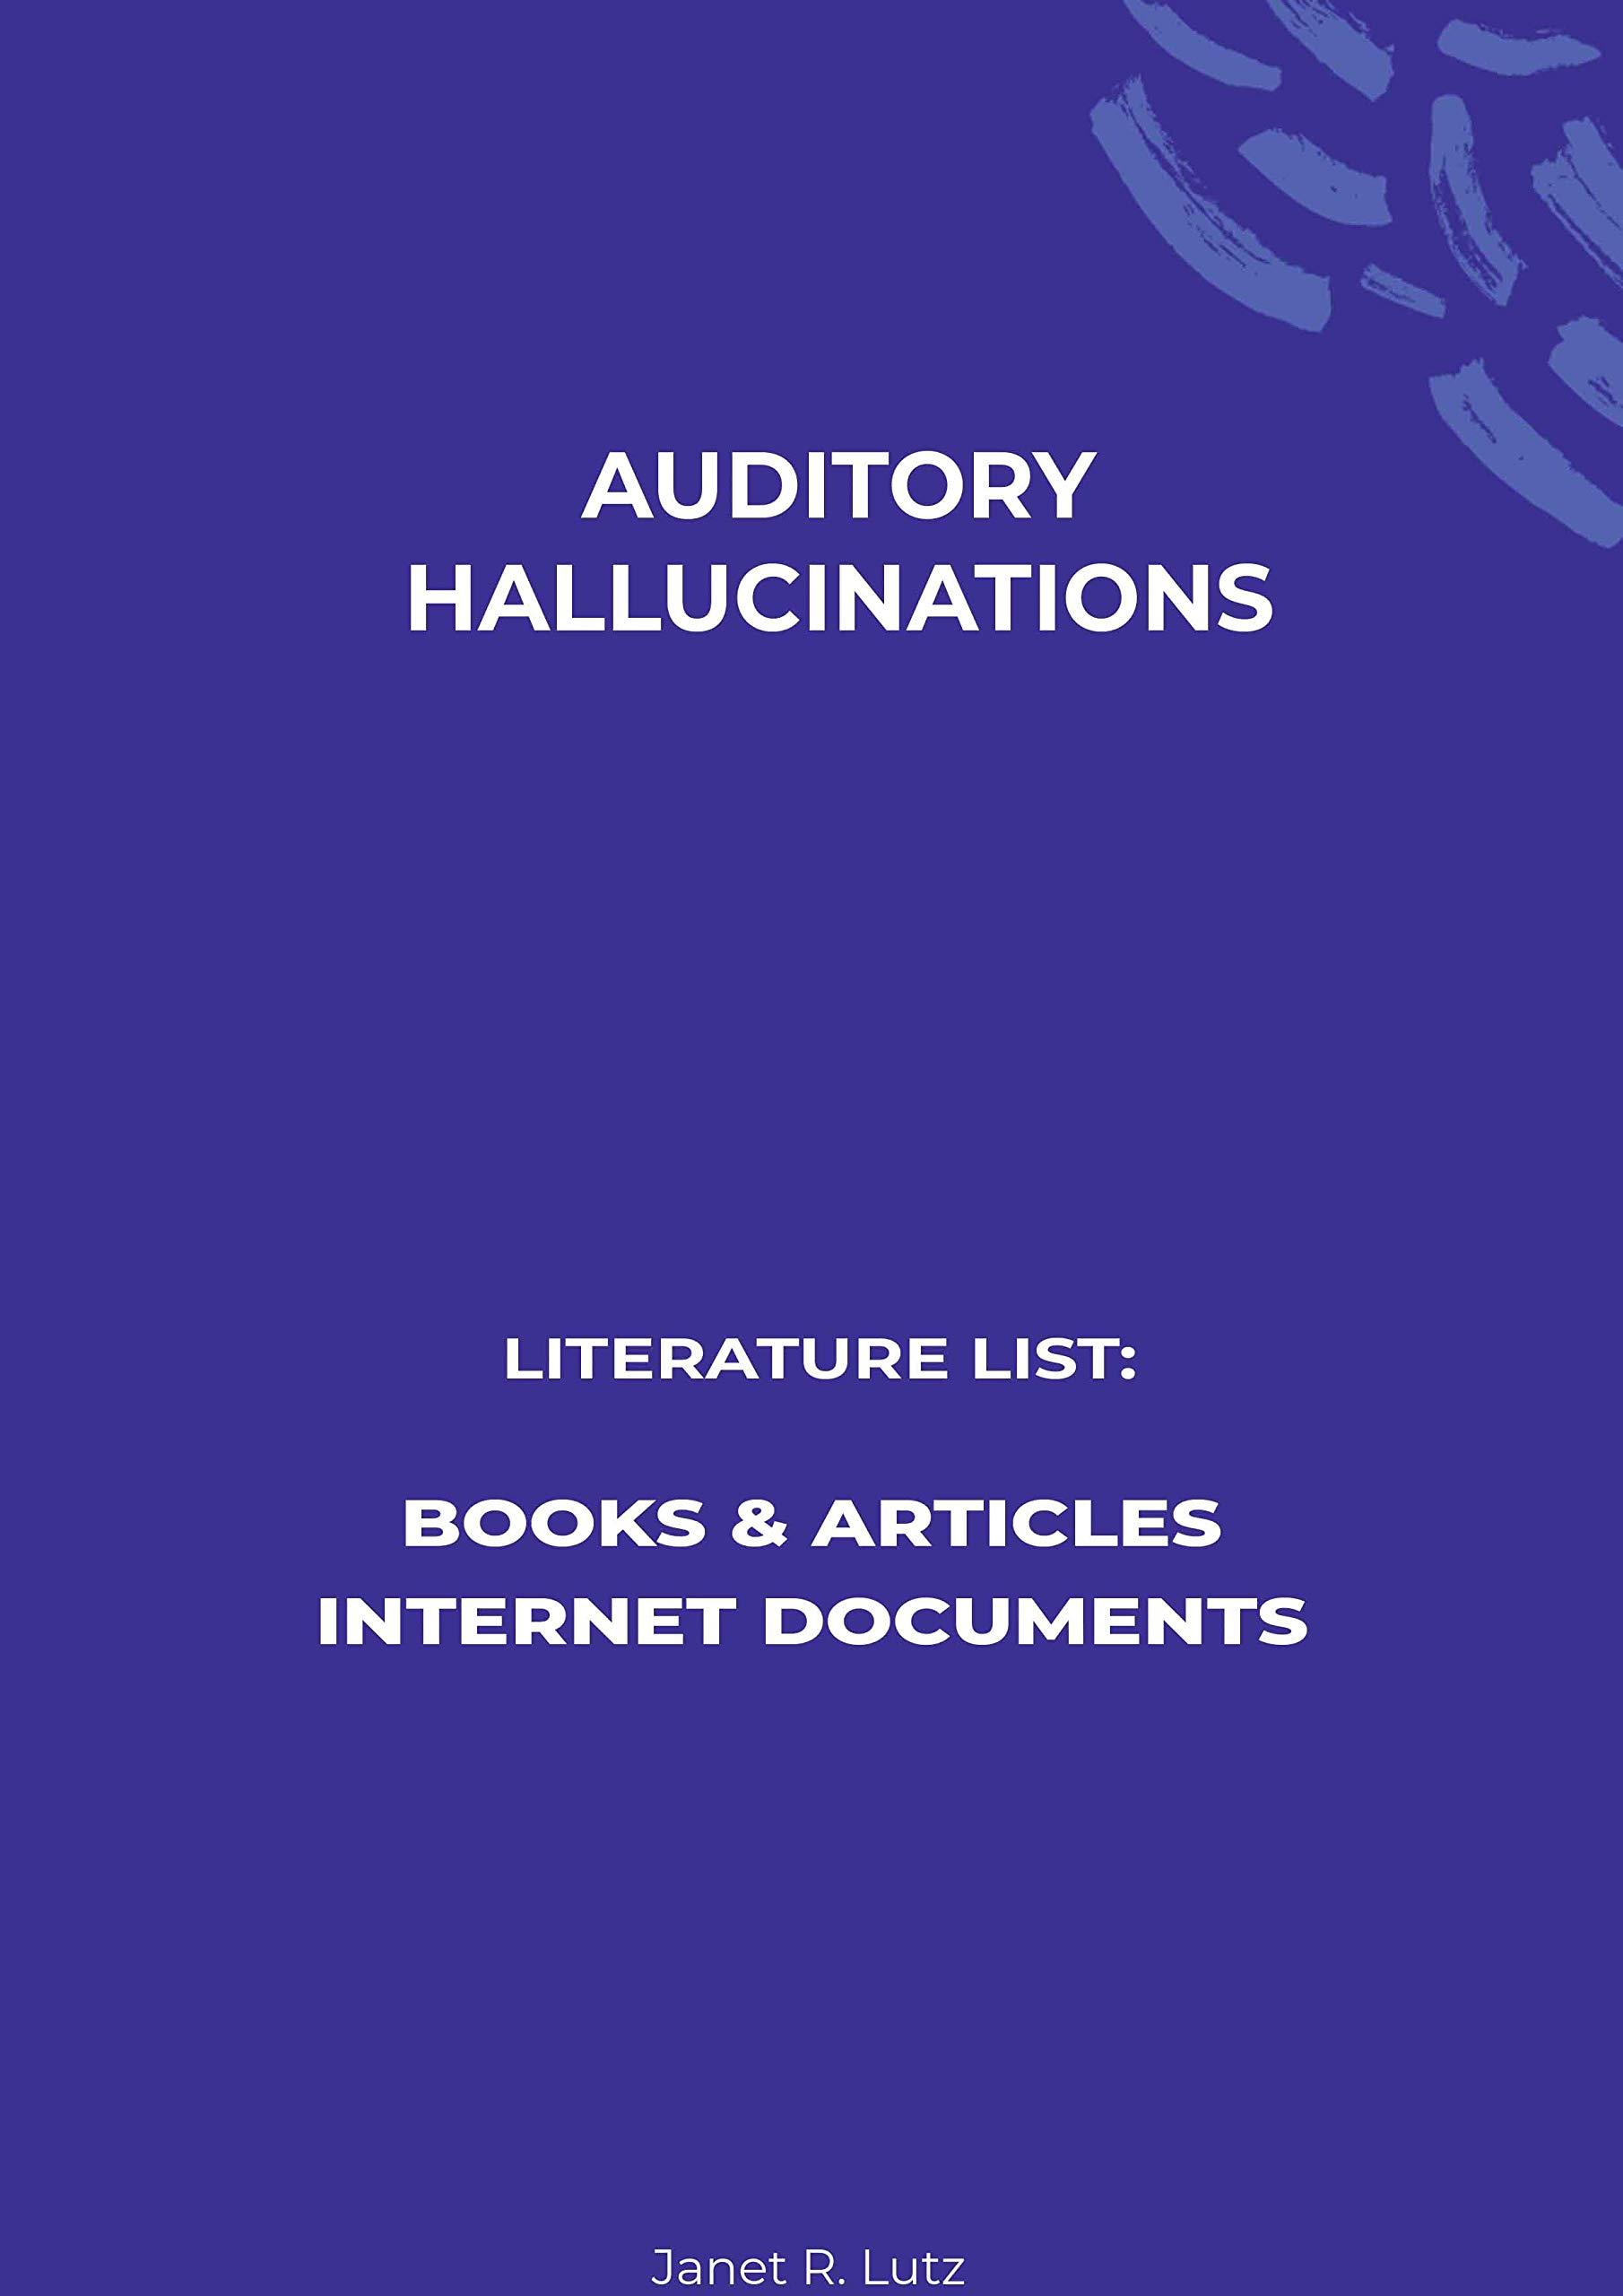 Auditory Hallucinations - Literature list: Books & Articles, Internet Documents